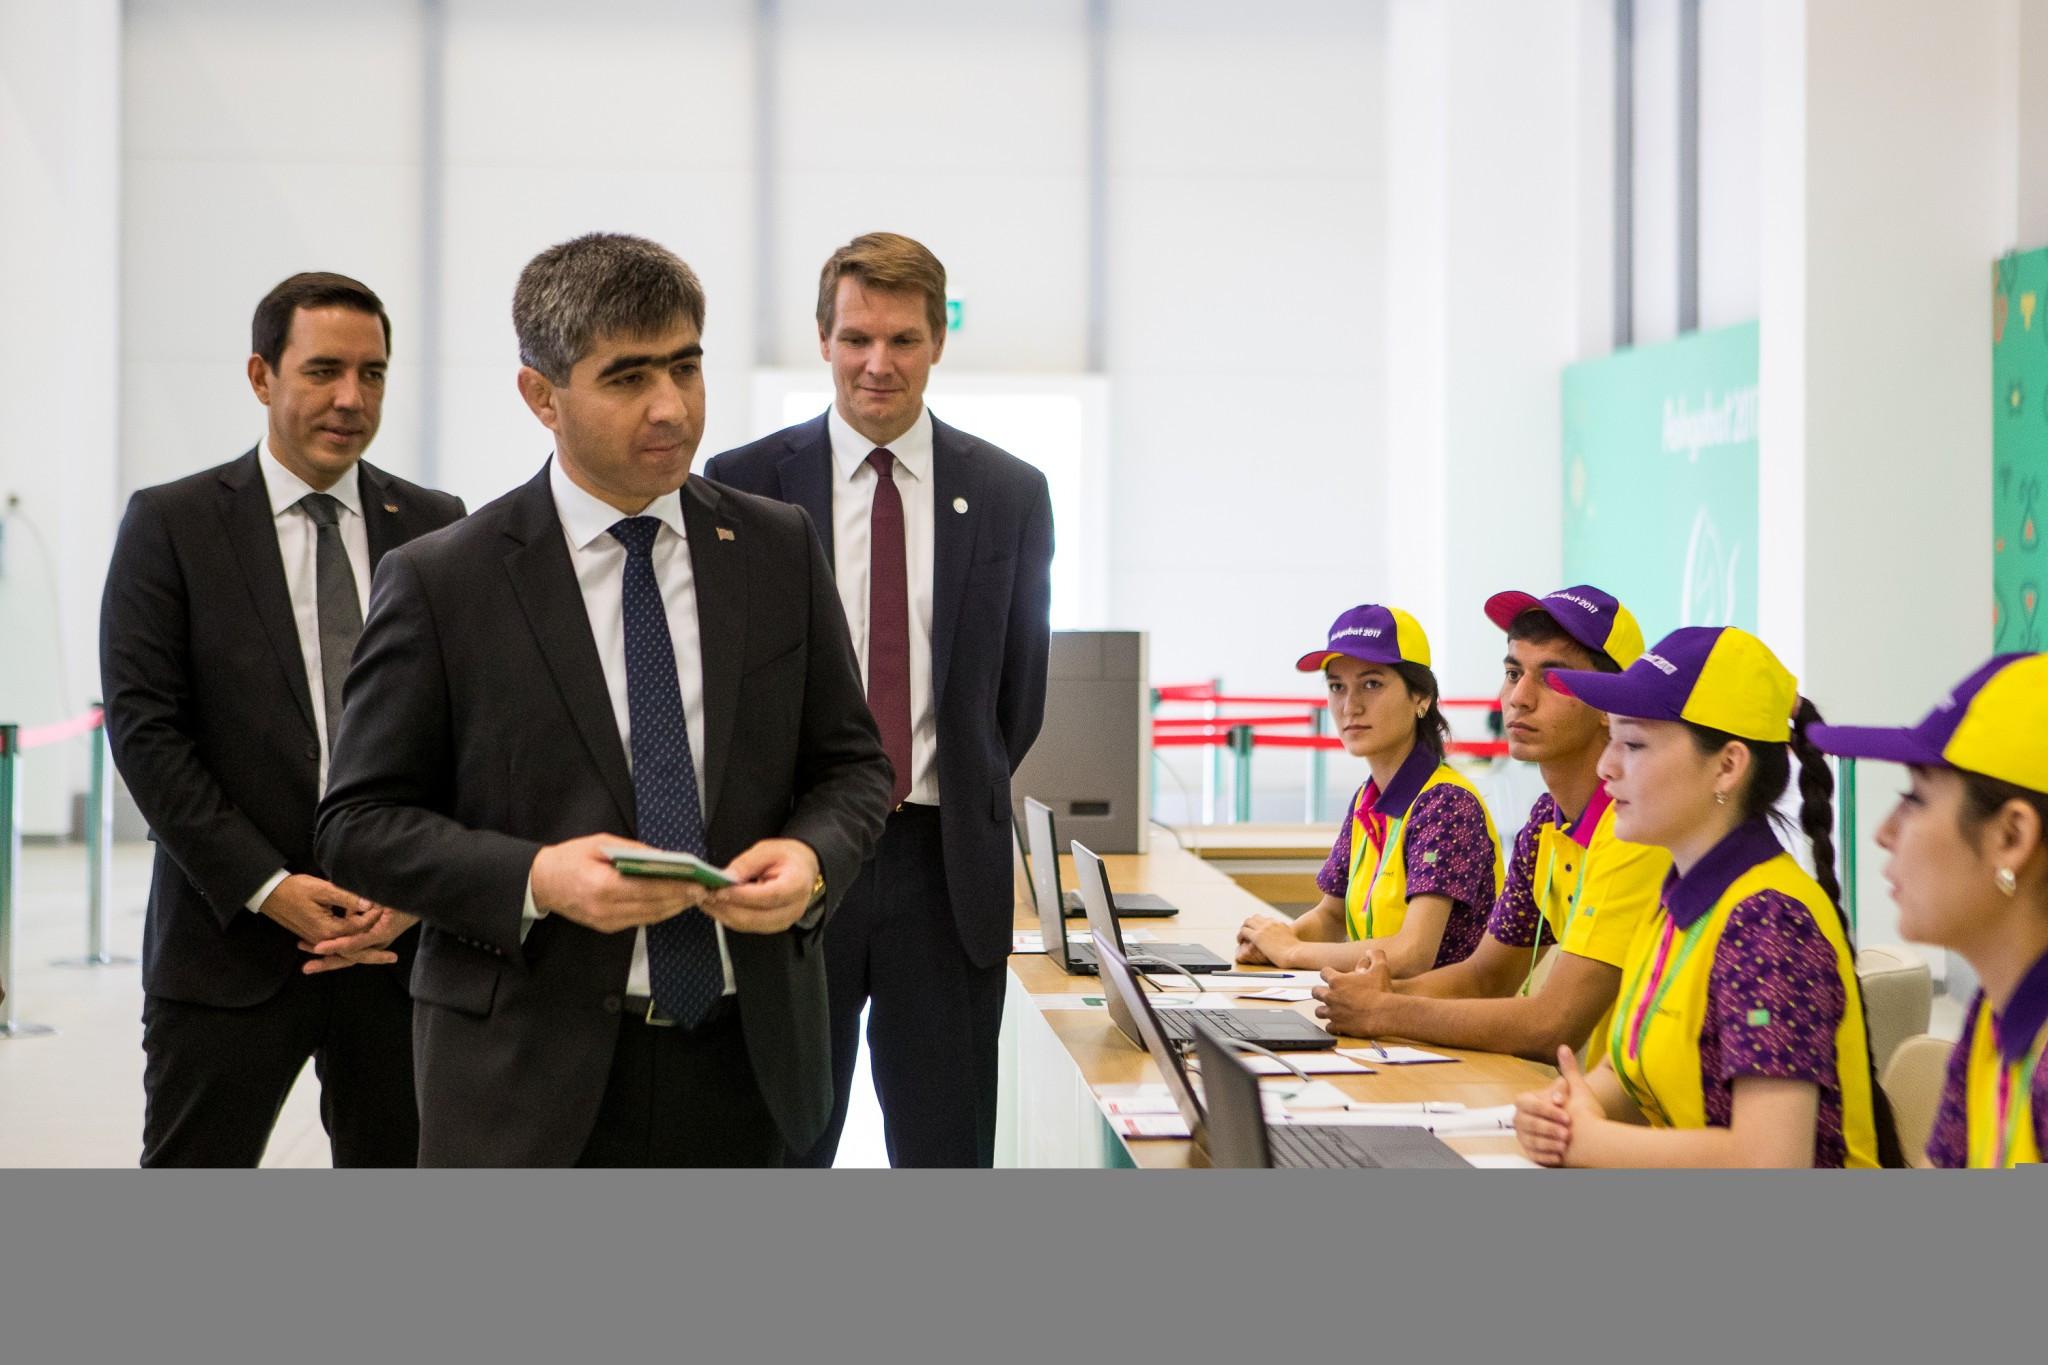 Ashgabat 2017 open Uniform Distribution and Accreditation Centre